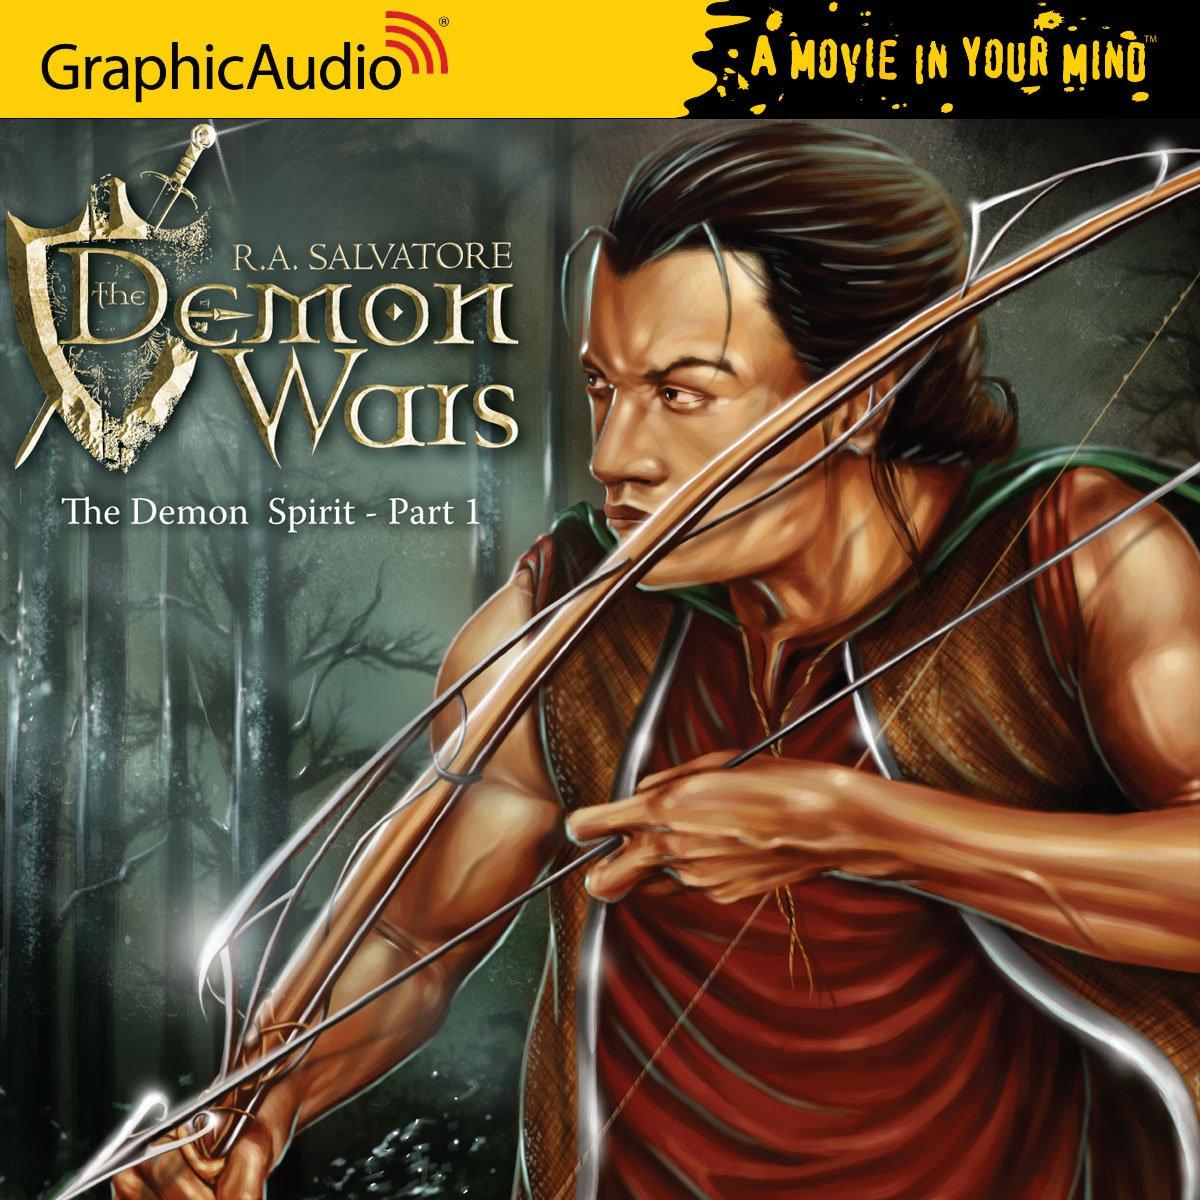 The Demon Wars - The Demon Spirit (Part 1) (The Demonwars) (The Demonwars Saga) ebook